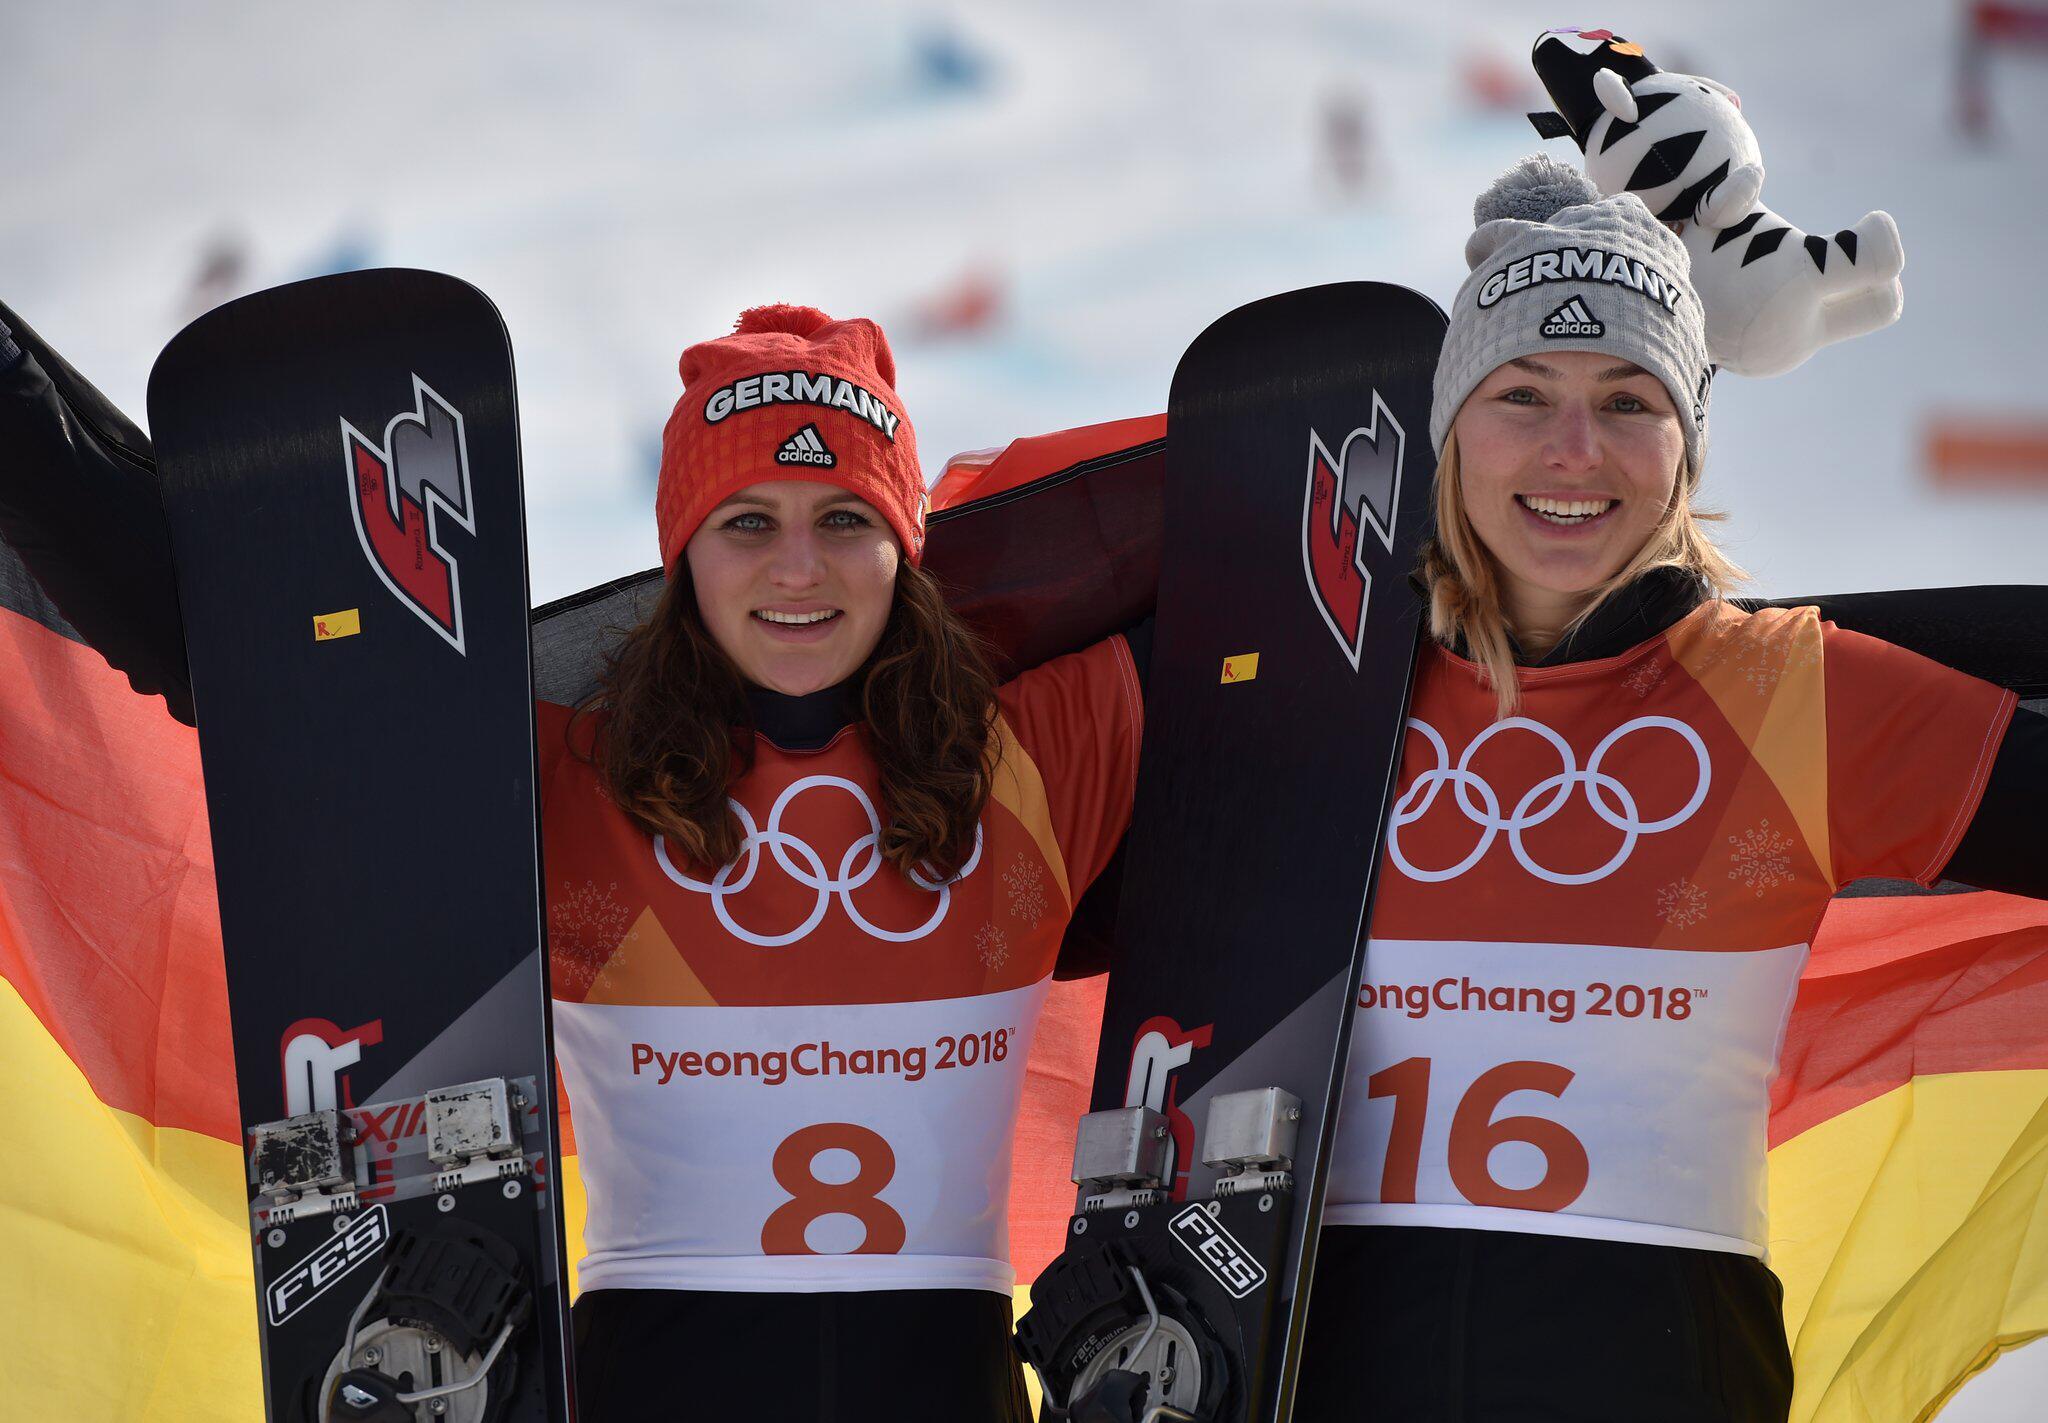 Bild zu Pyeongchang 2018, Snowboard